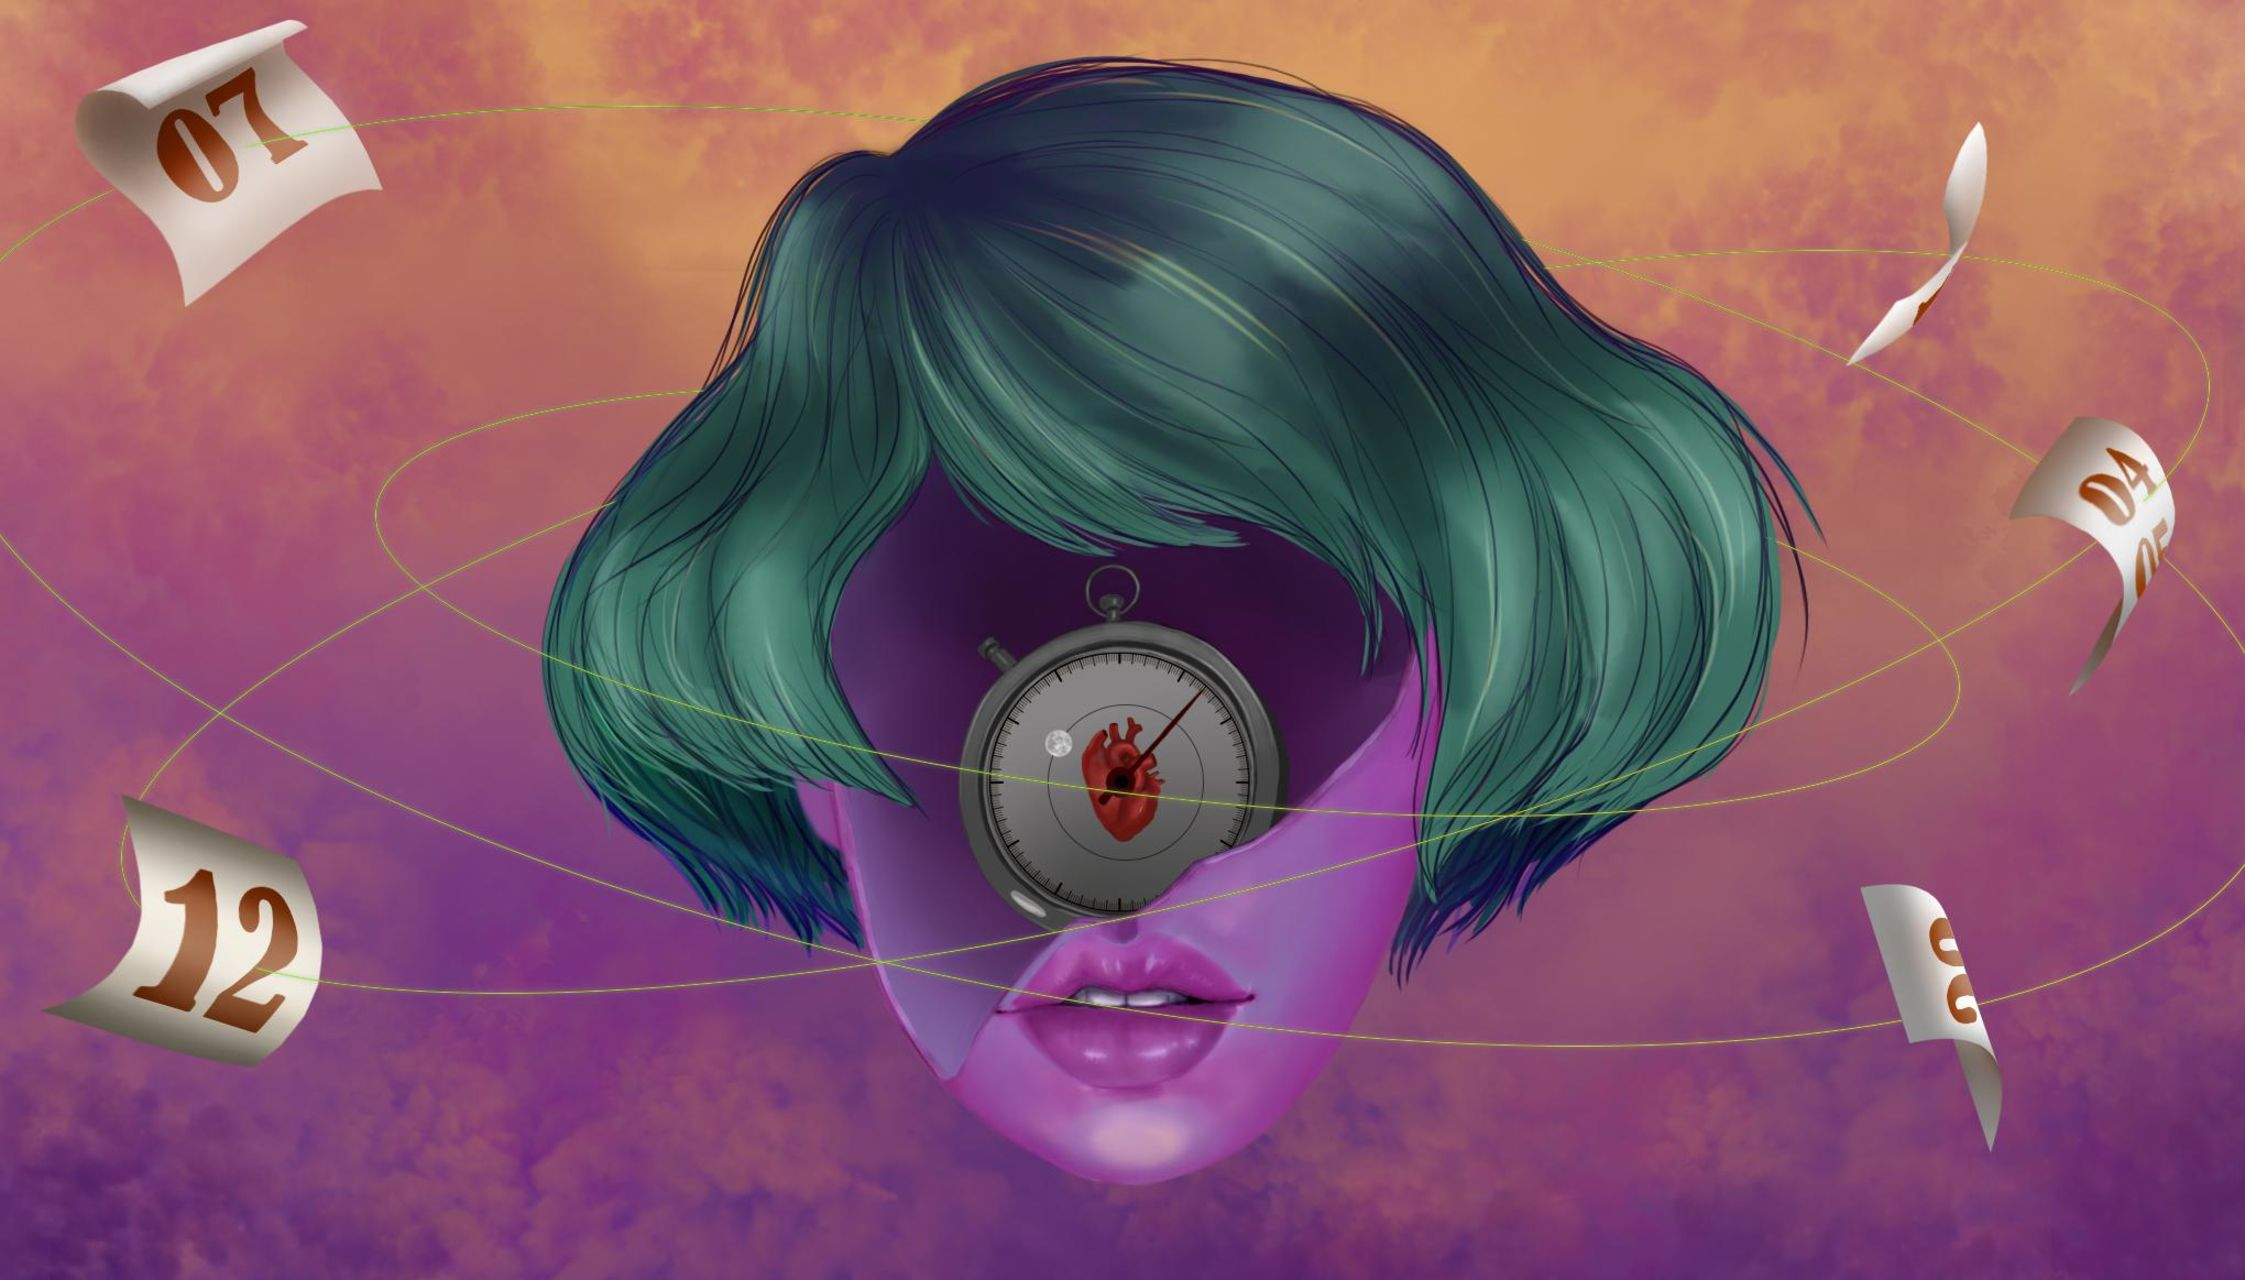 Digital art, colourful artwork